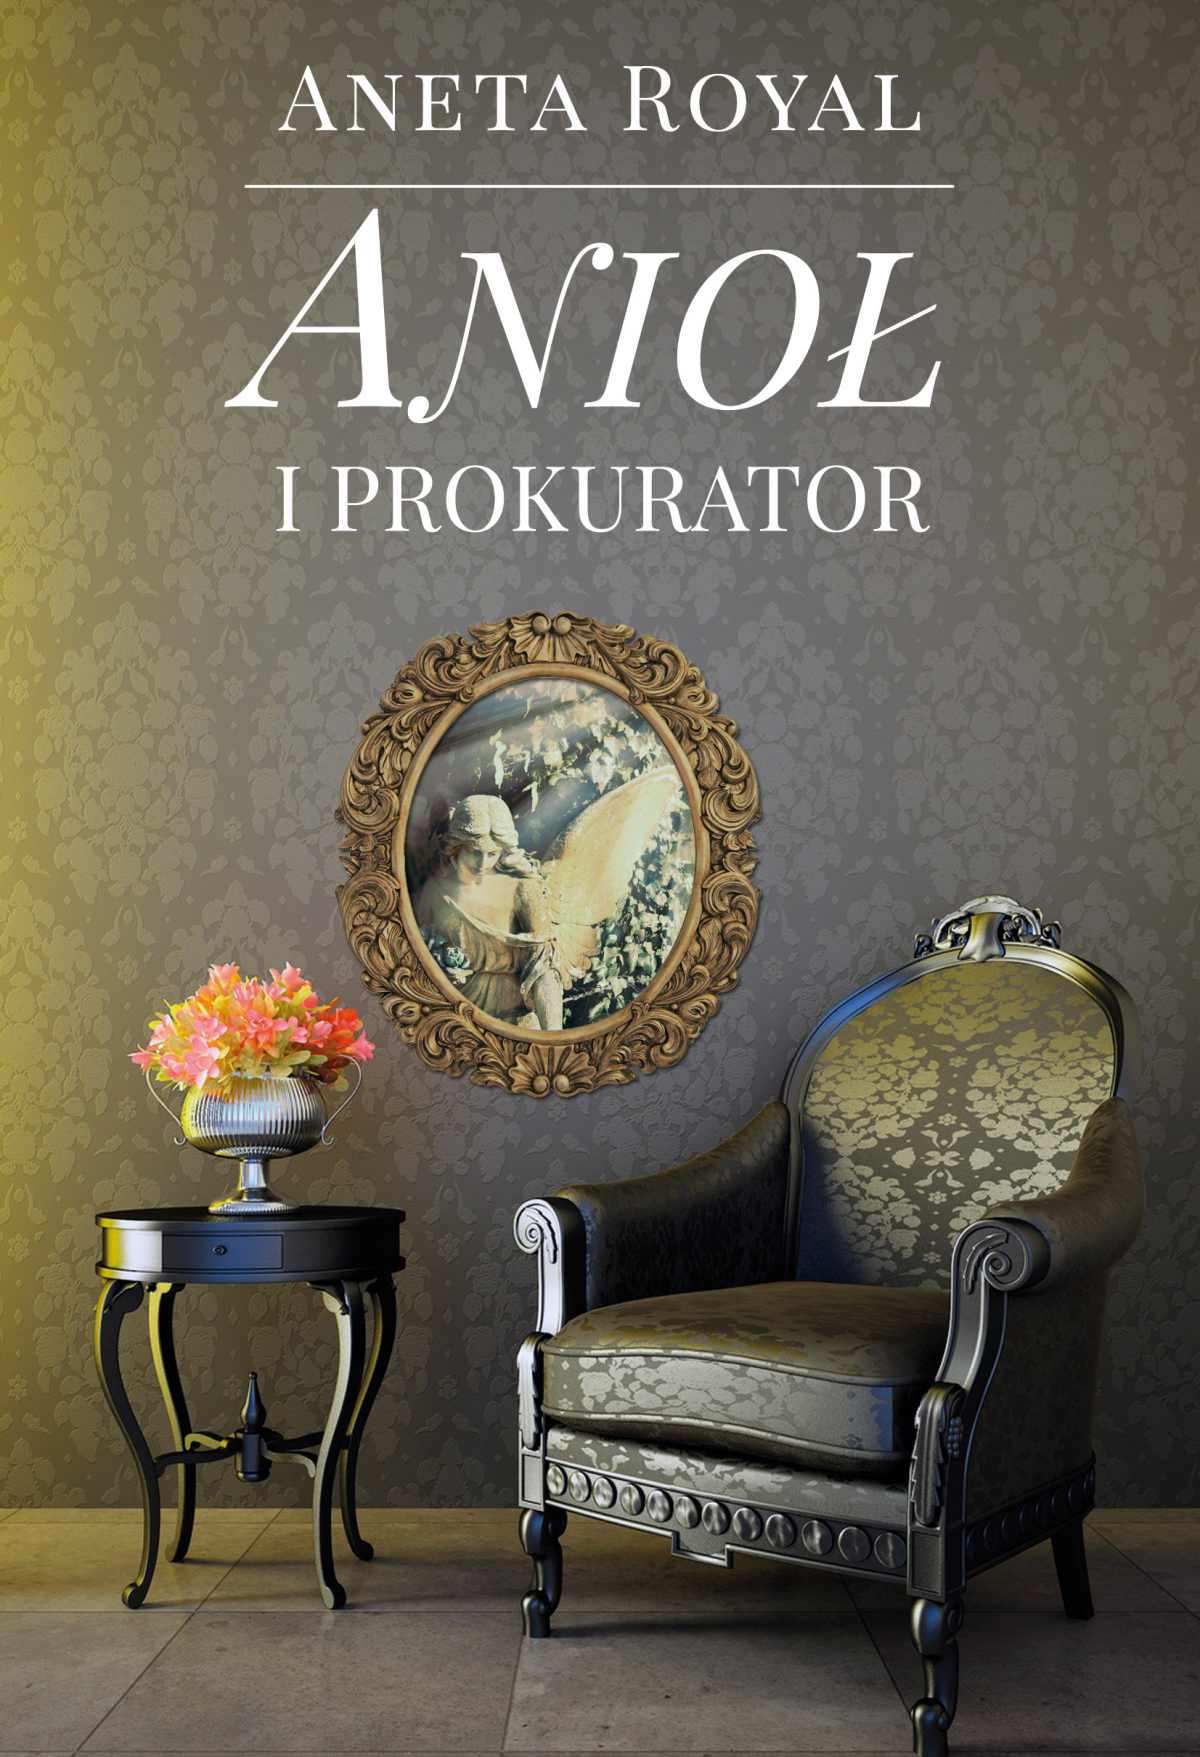 Anioł i prokurator - Ebook (Książka na Kindle) do pobrania w formacie MOBI